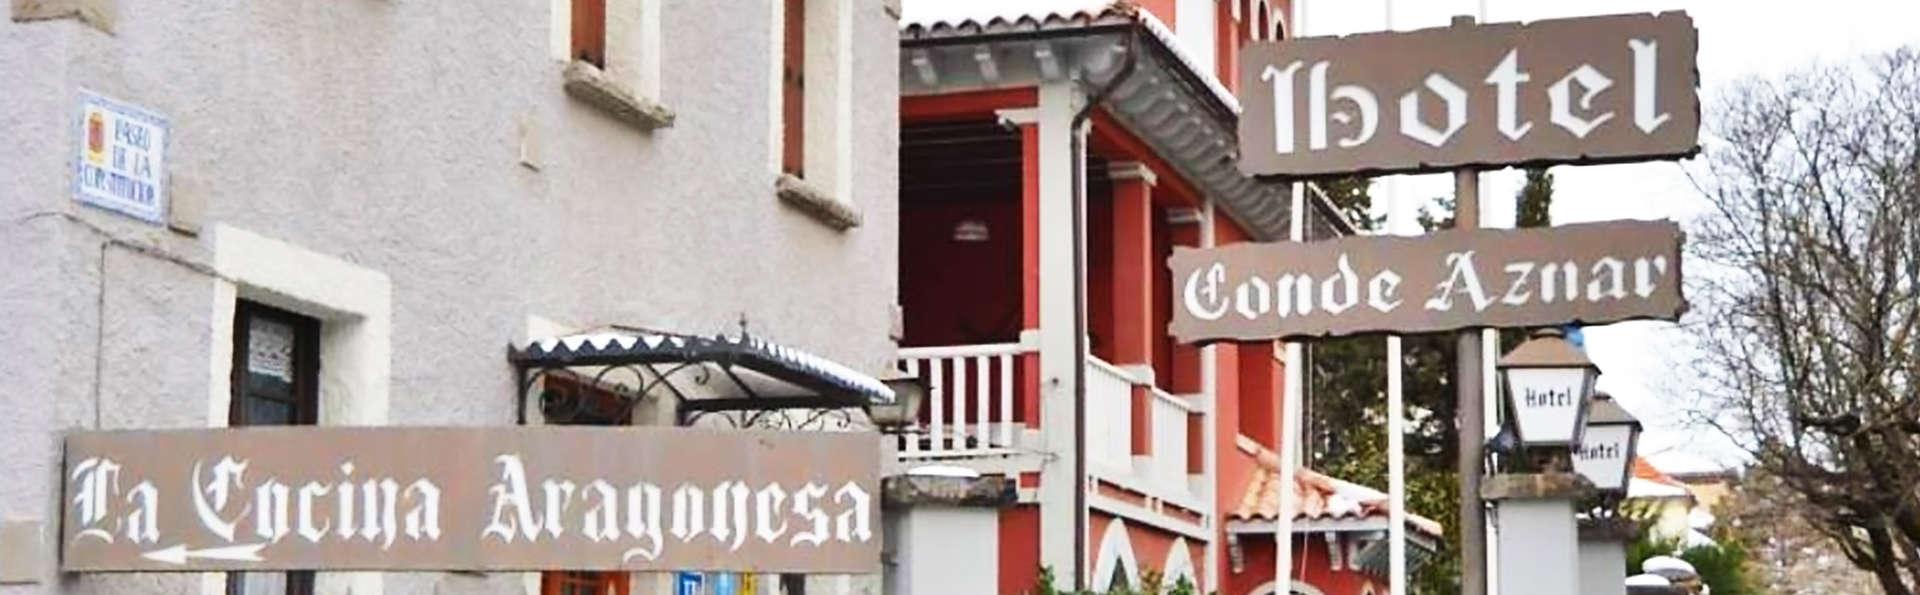 Hotel Conde Aznar - EDIT_ext1.jpg